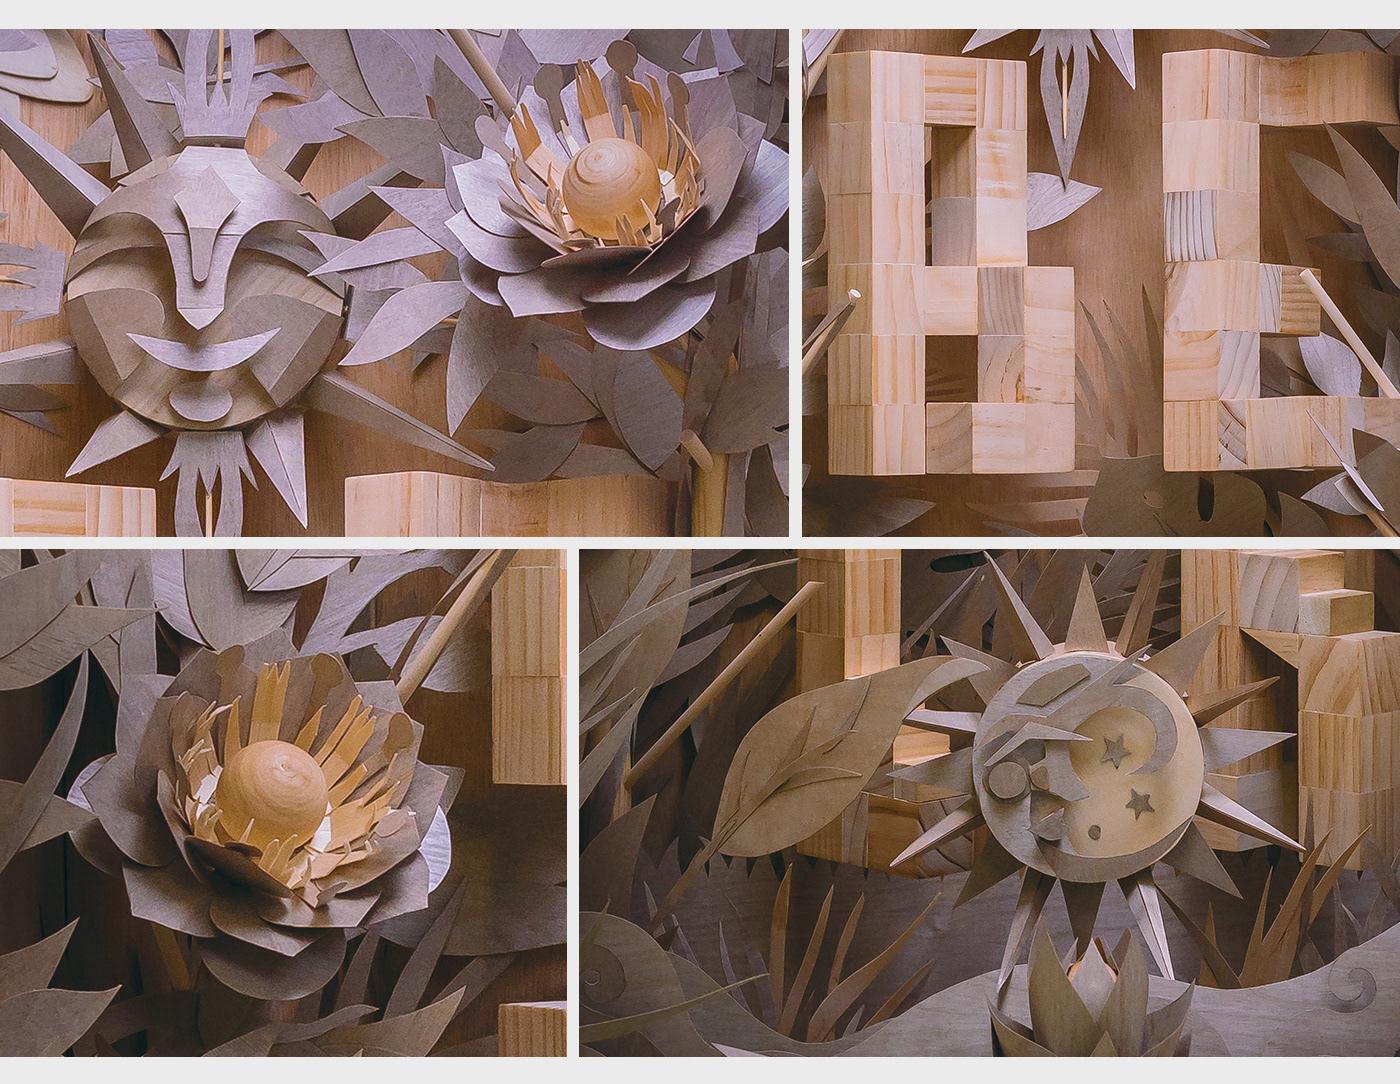 AR poster wood sculpture handmade lettering Flowers floral PosterArt music